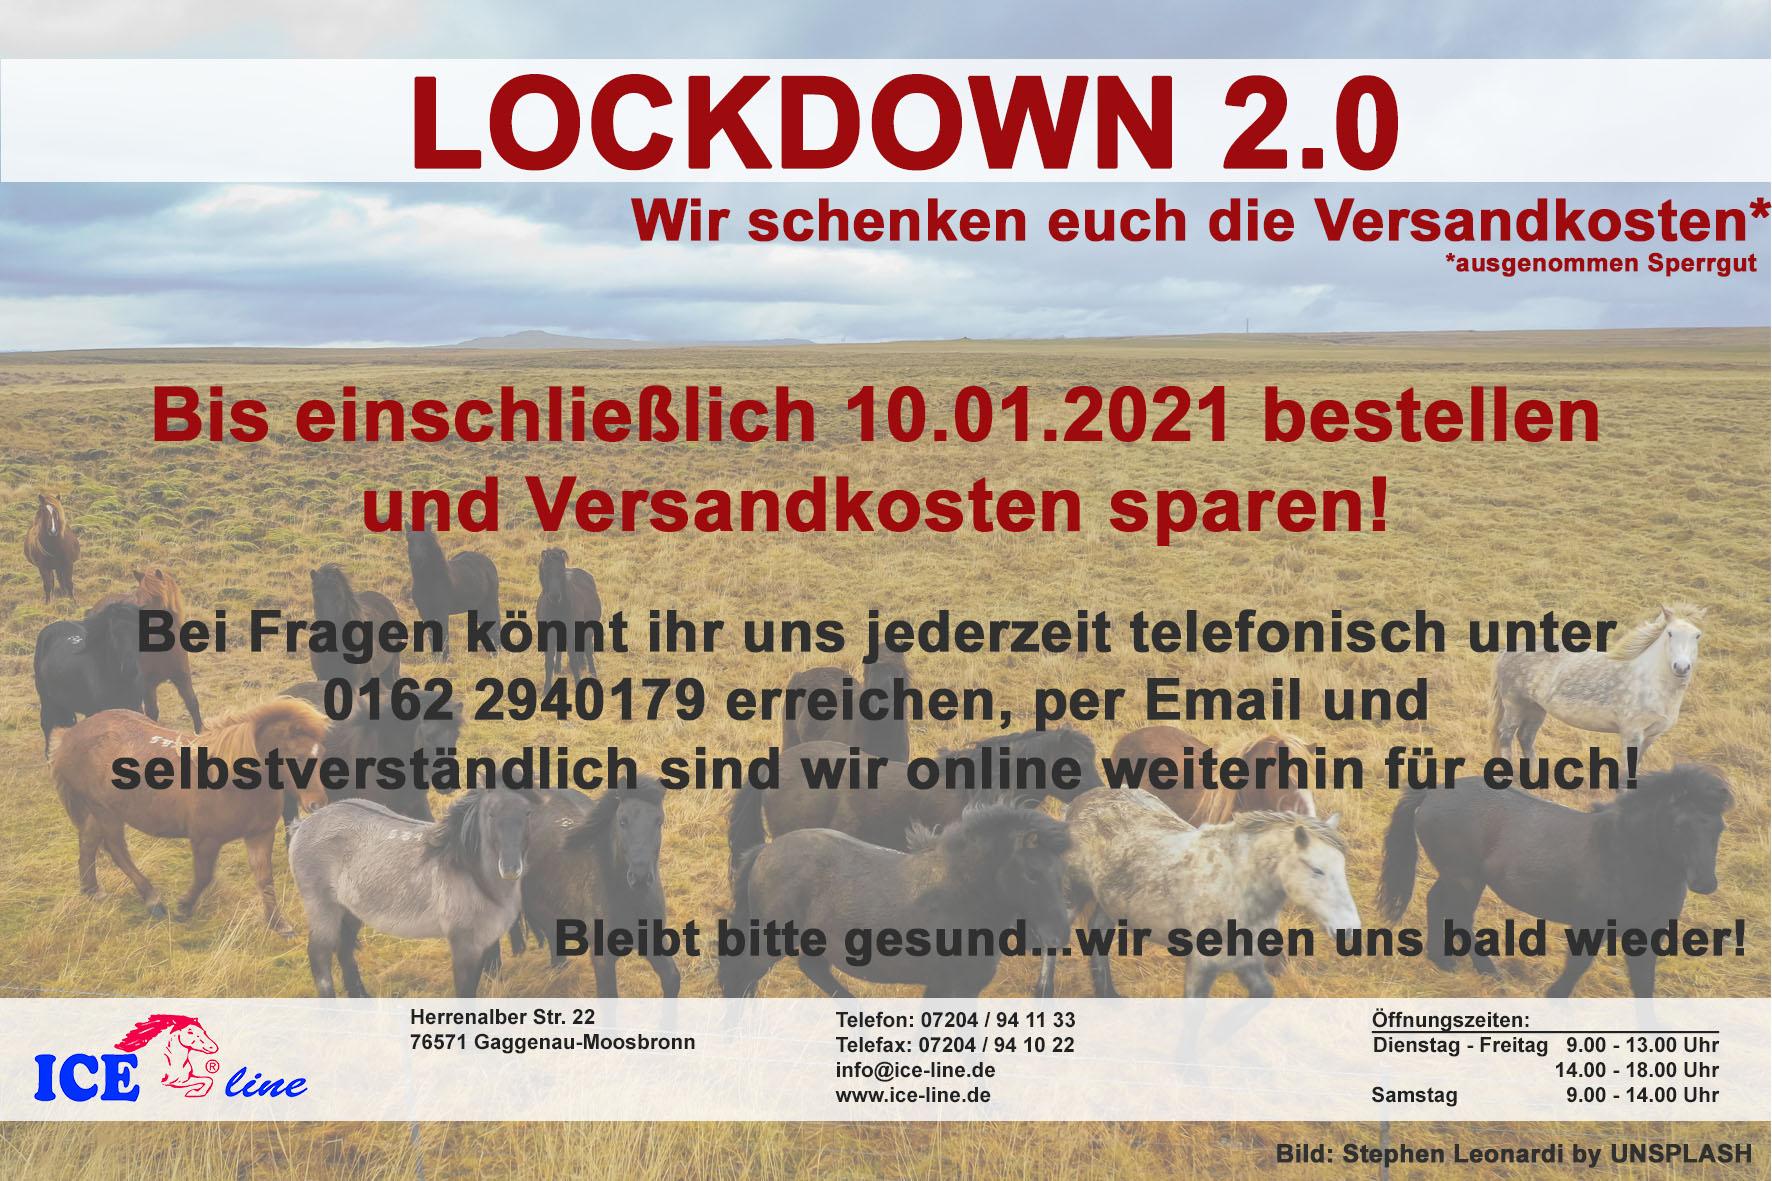 Lockdown 2.0 2